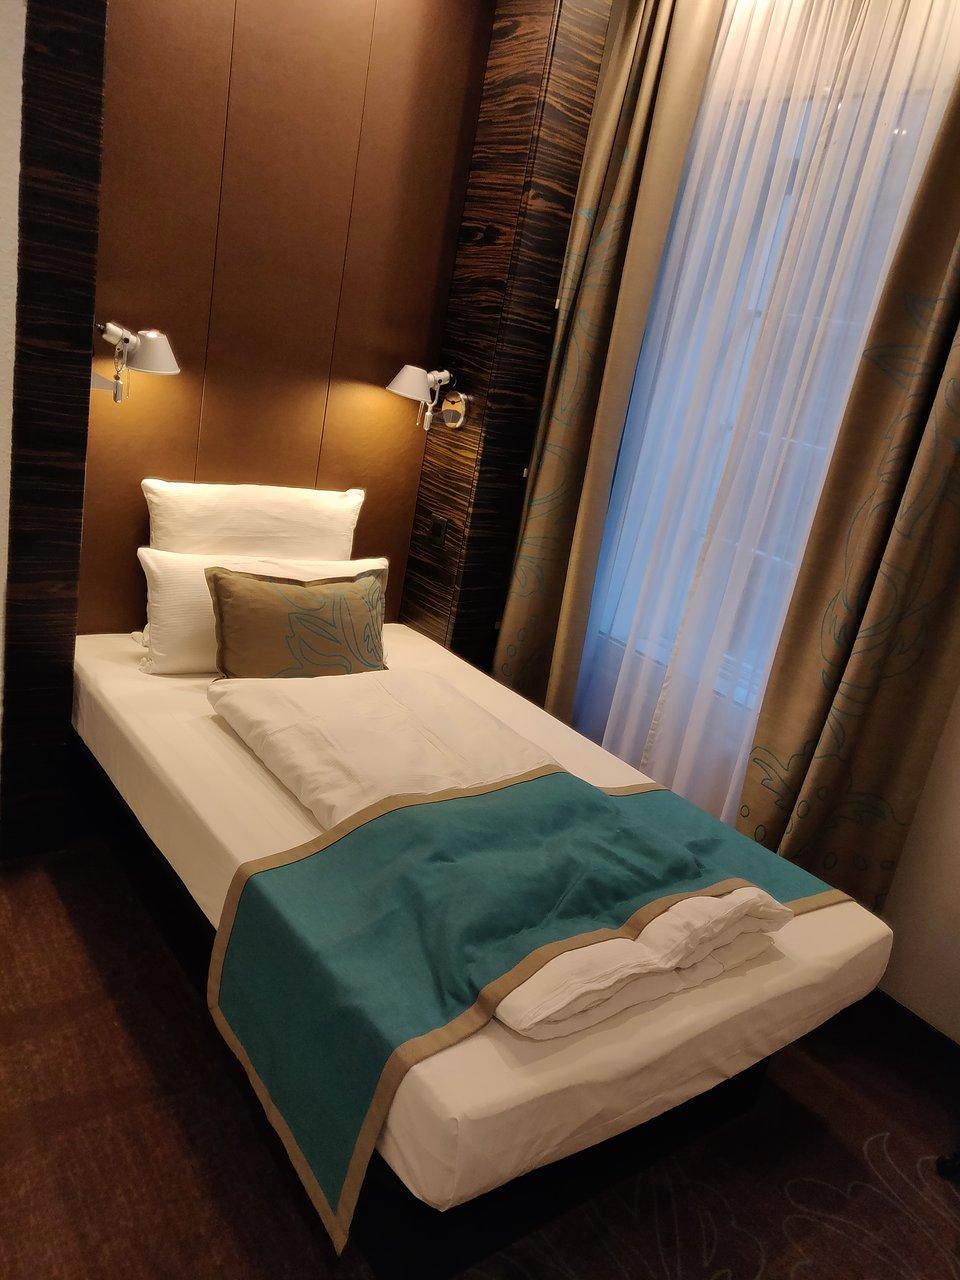 MOTEL ONE EDINBURGH ROYAL Hotel Reviews Photos